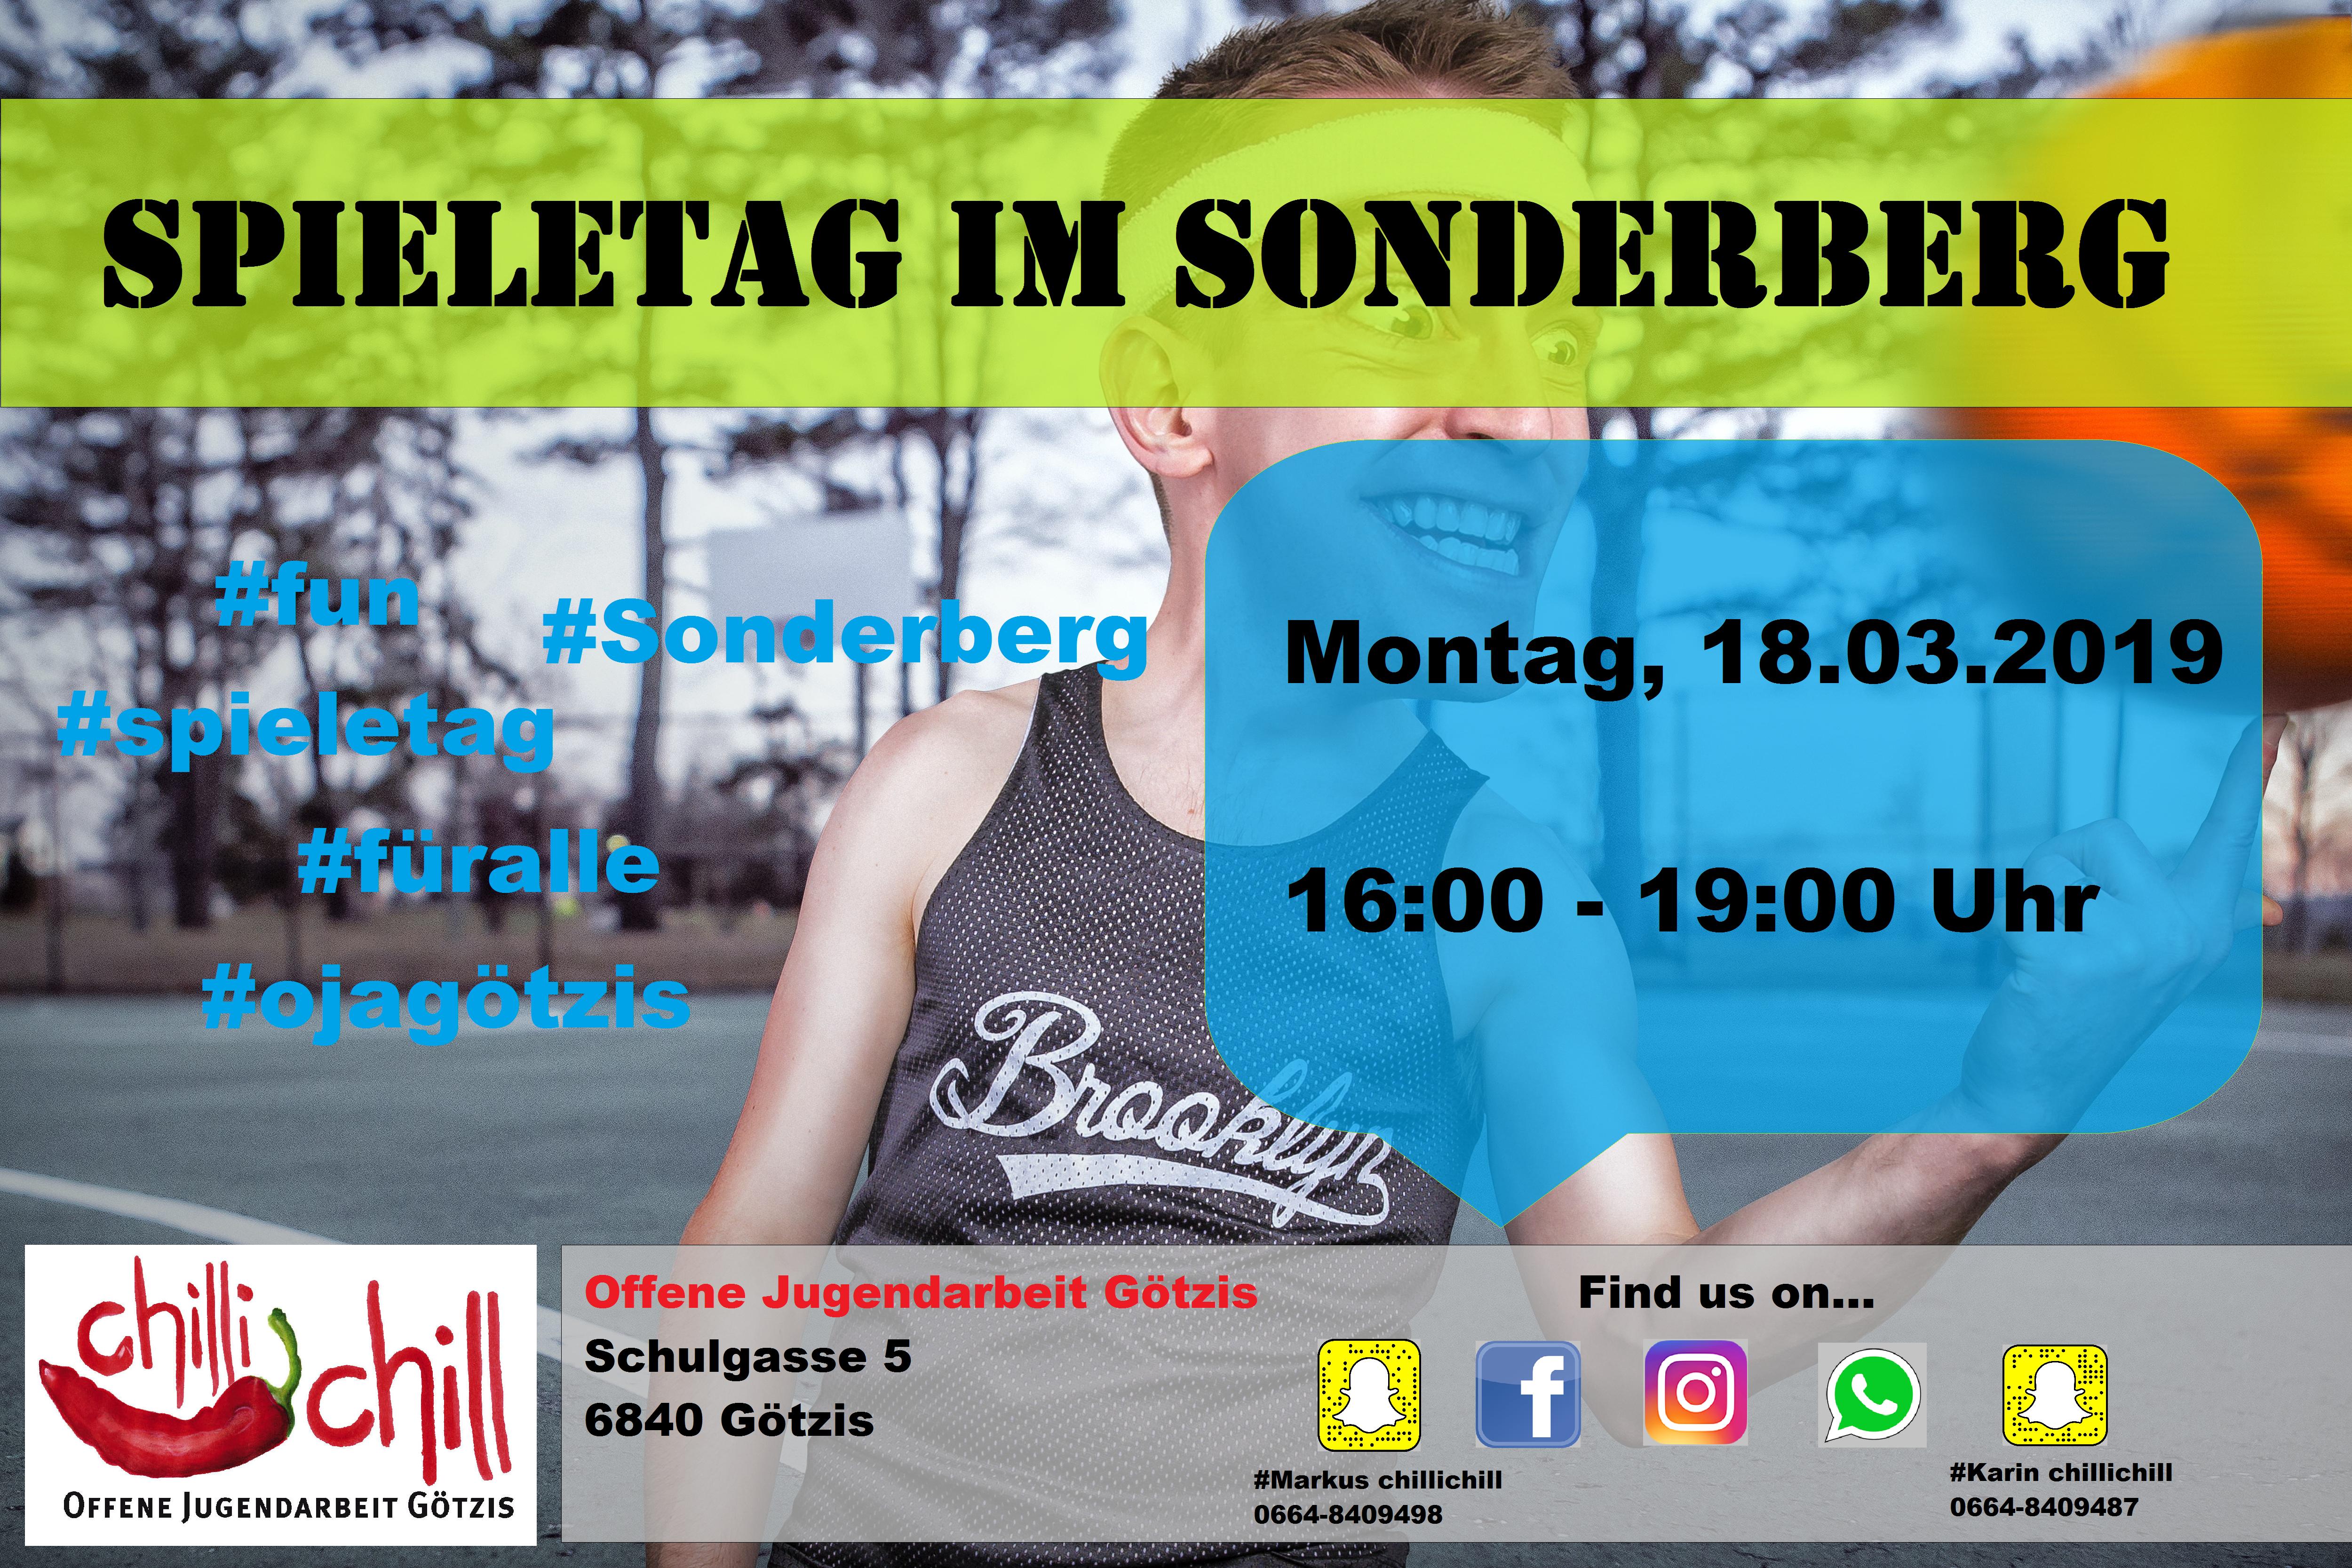 Spieletag im Sonderberg